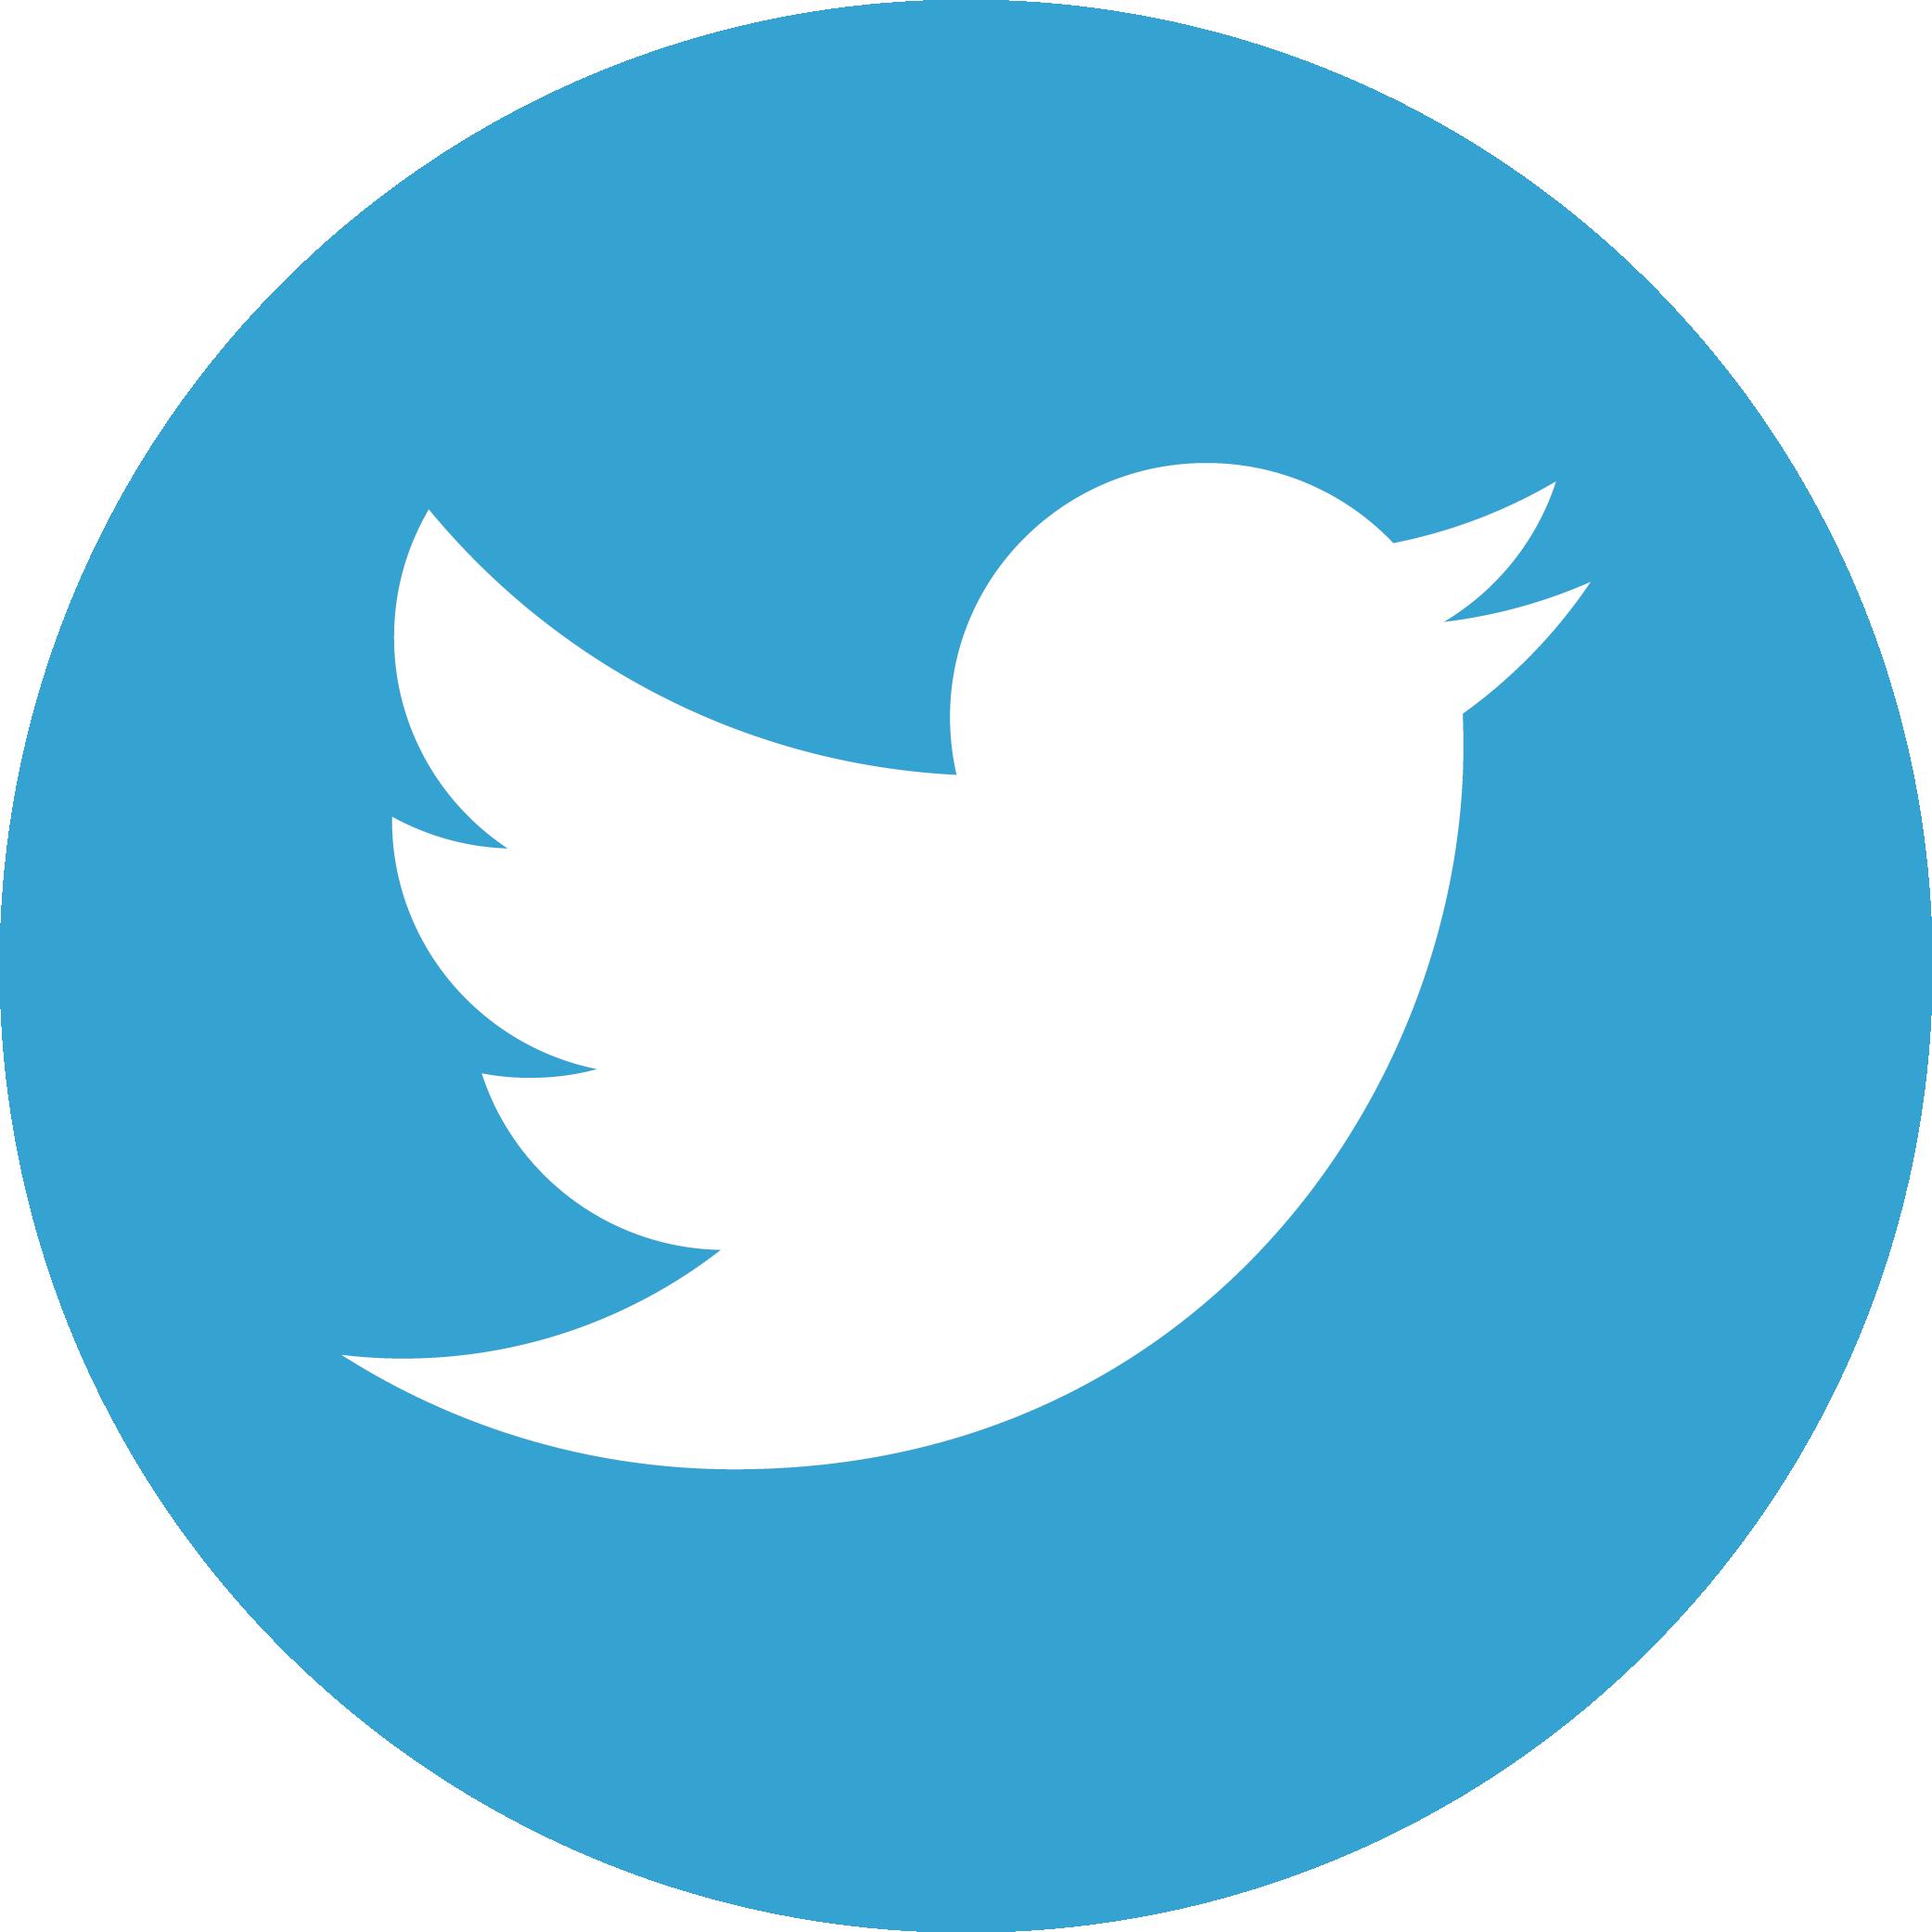 Coras Twitter